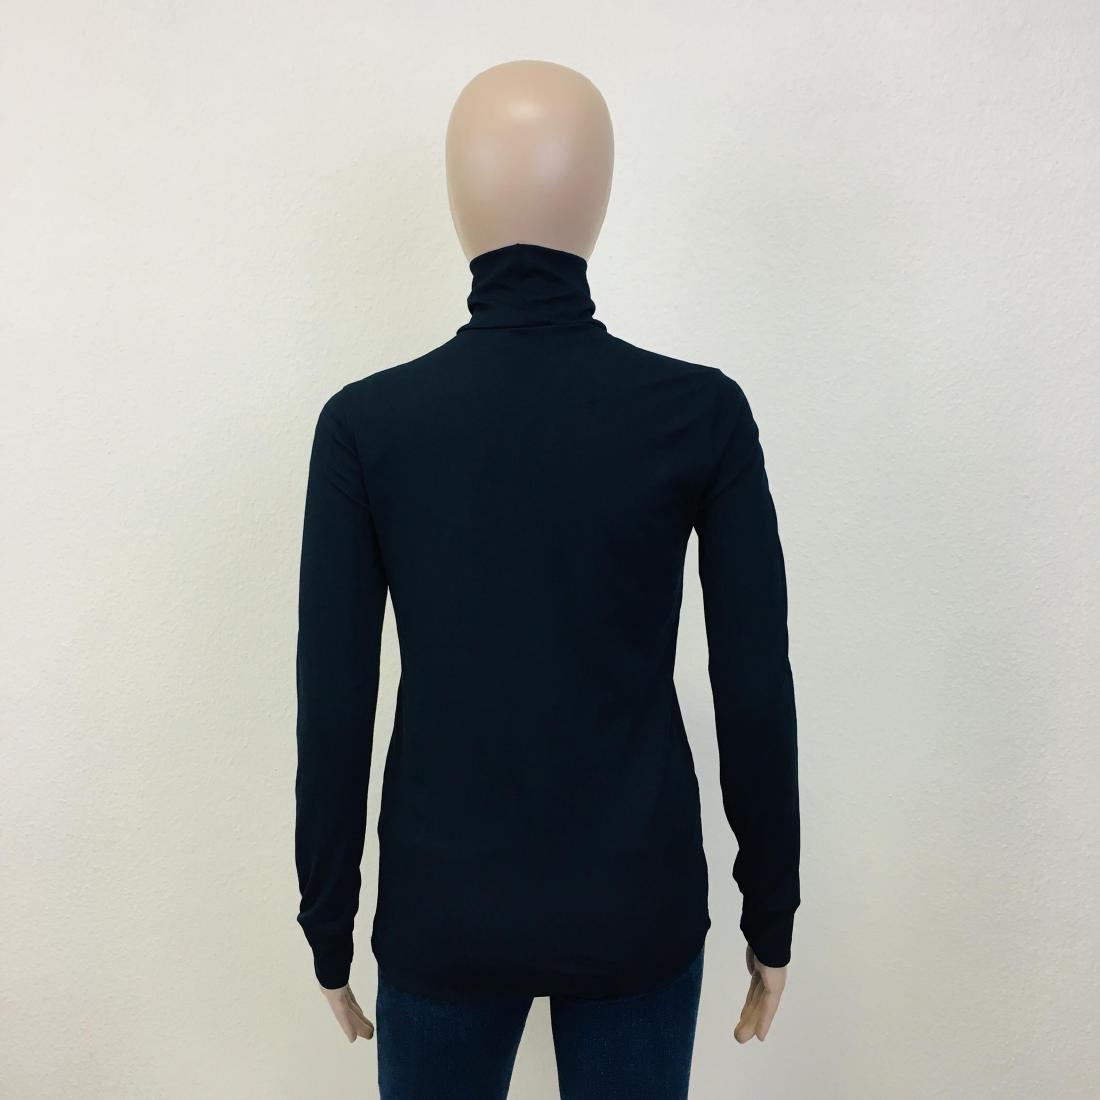 New Women's ZARA Turtleneck Sweater Size M - 7